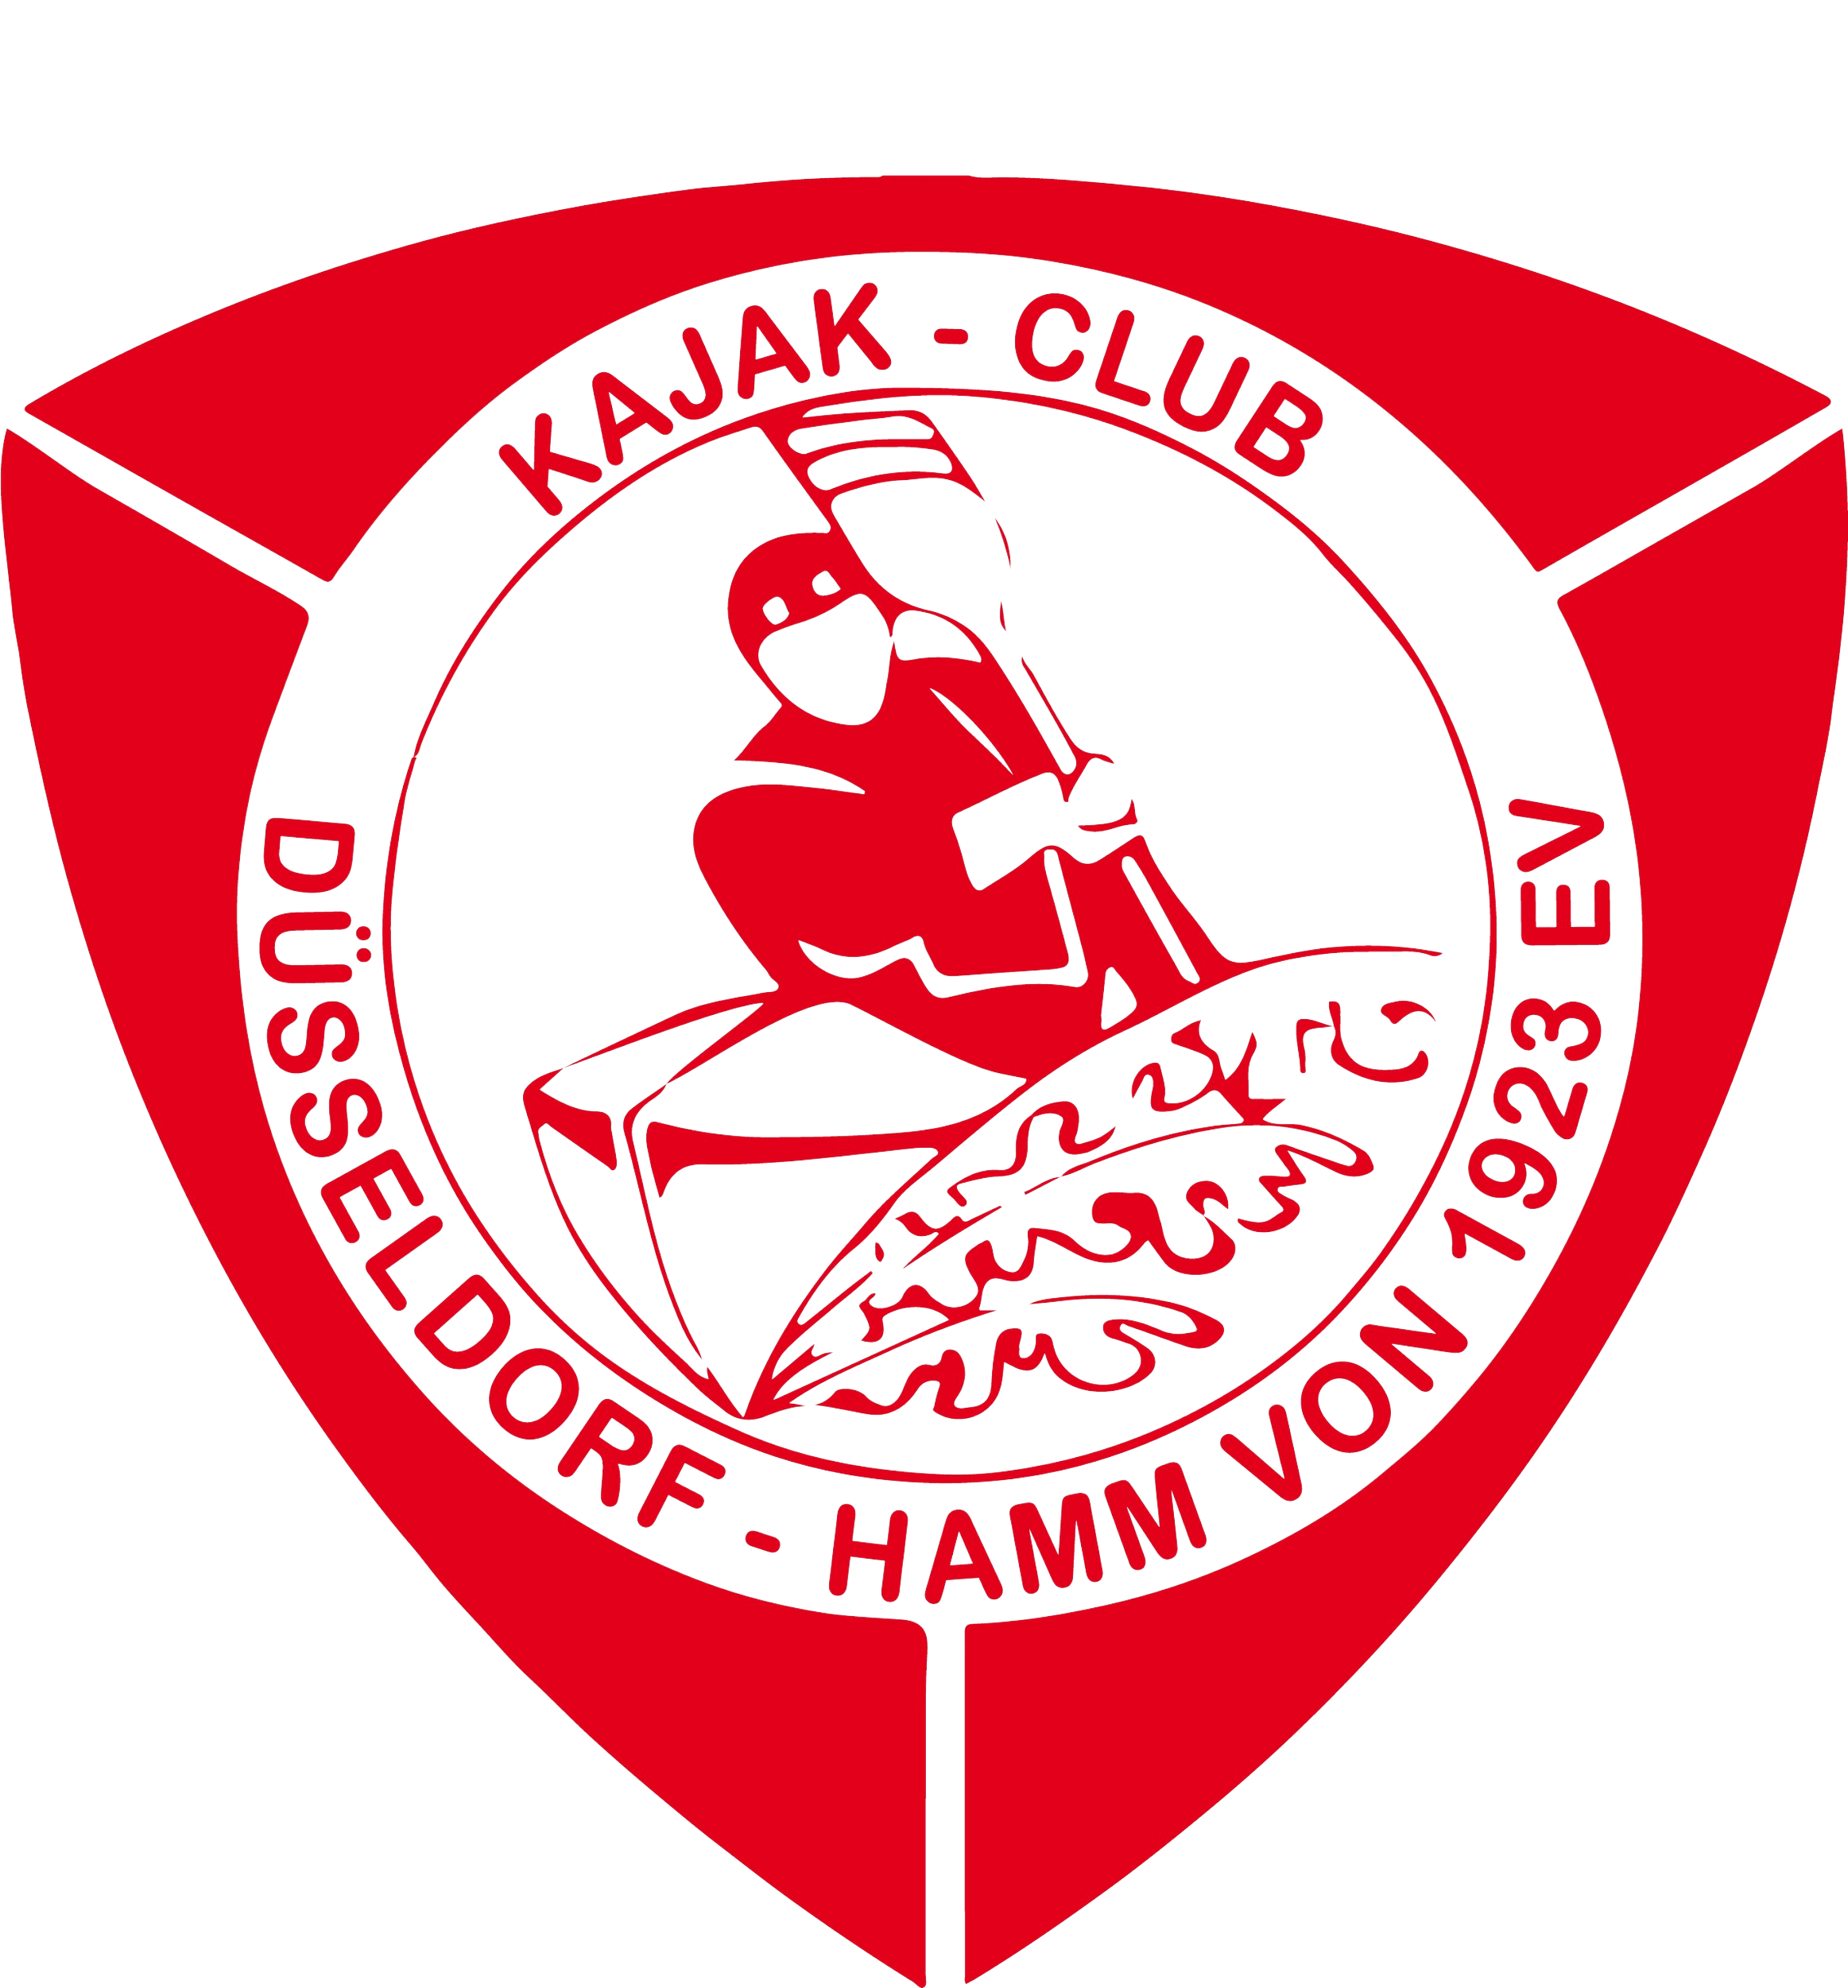 Kajak Club Düsseldorf Hamm 1923 e.V.